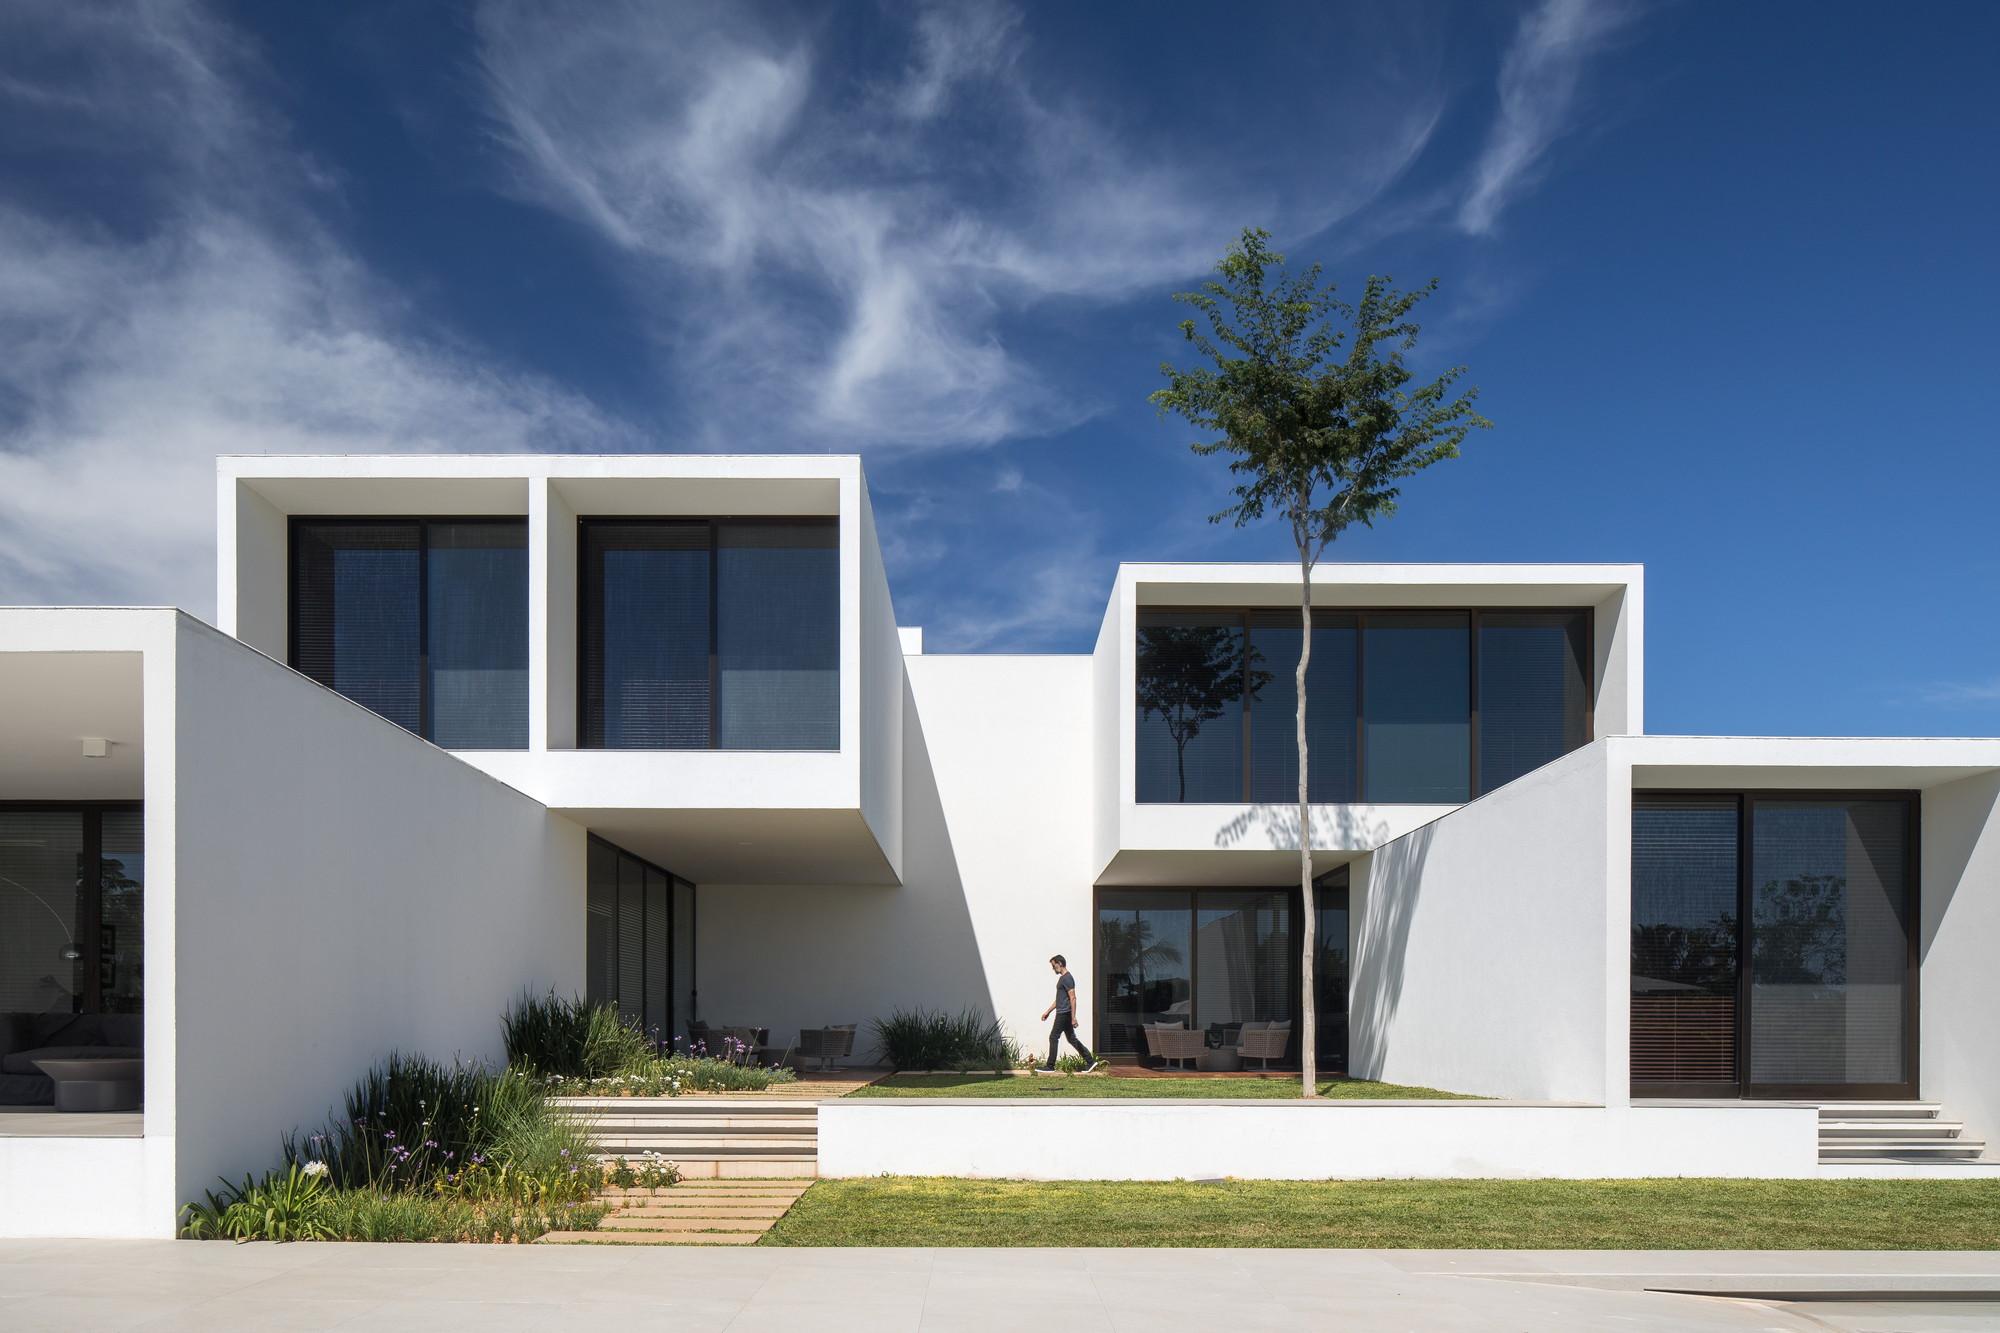 House of Courtyards / BLOCO Arquitetos